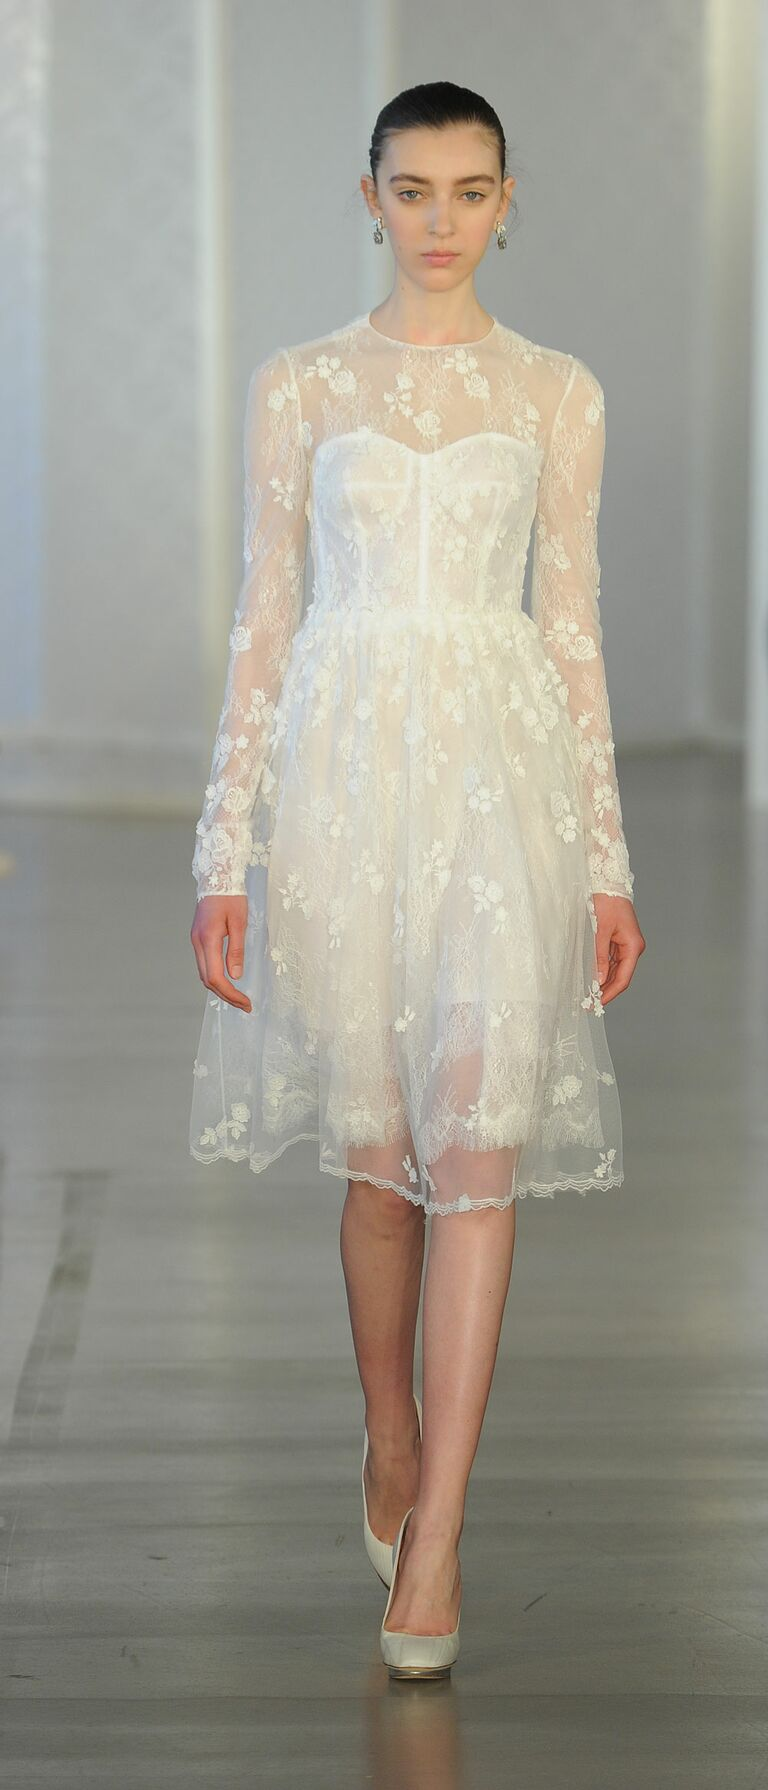 short wedding dresses for courthouse courthouse wedding dresses Short Wedding Dress With Sheer Sleeves